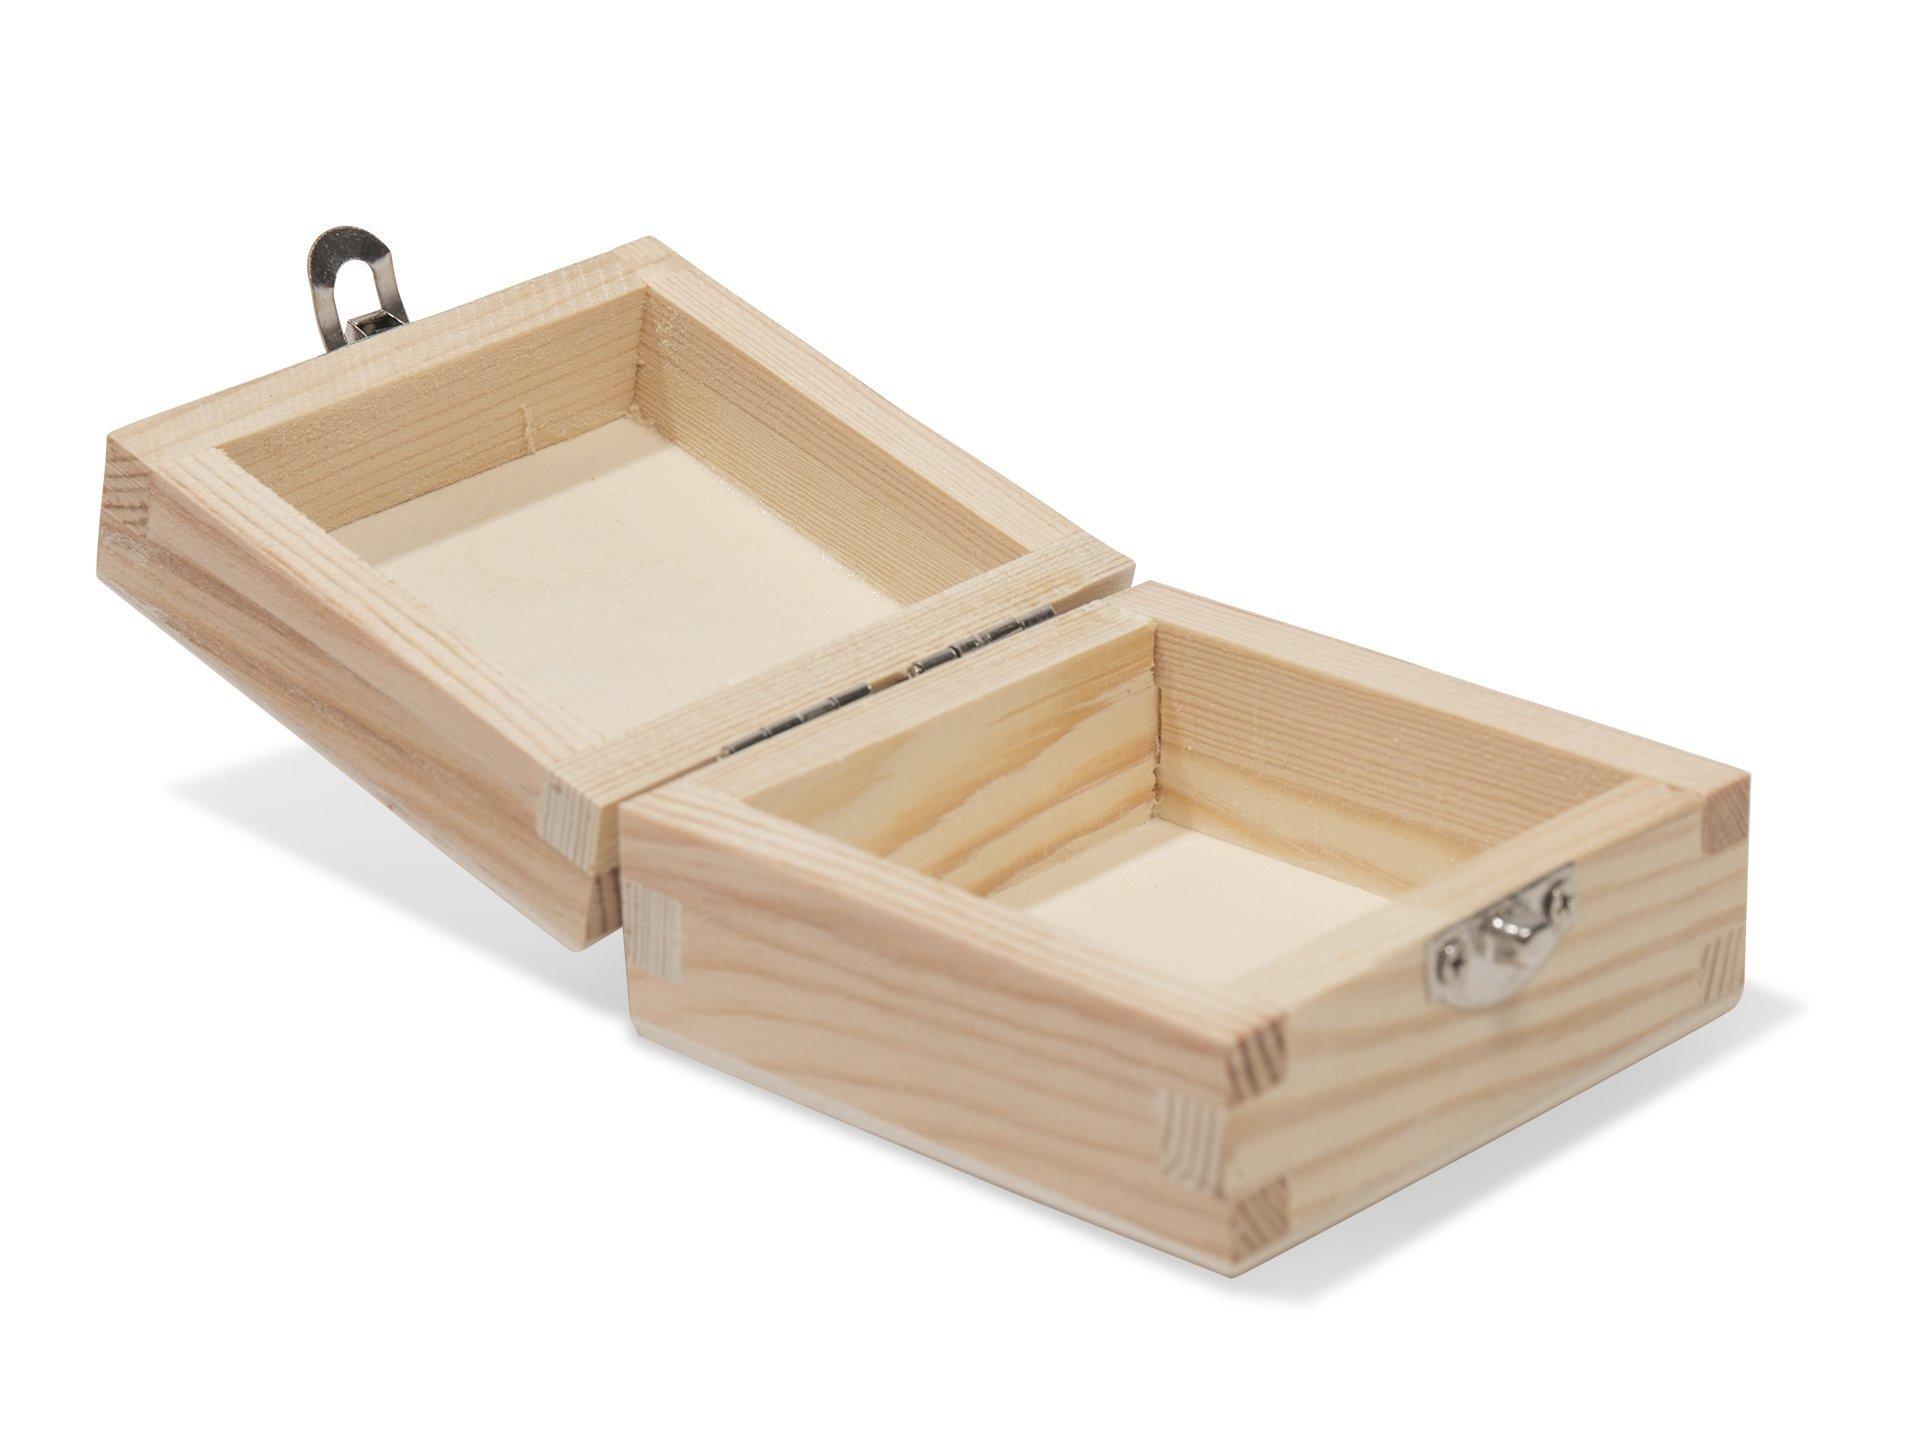 kunststoffboxen mit deckel transparent kunststoffboxen. Black Bedroom Furniture Sets. Home Design Ideas